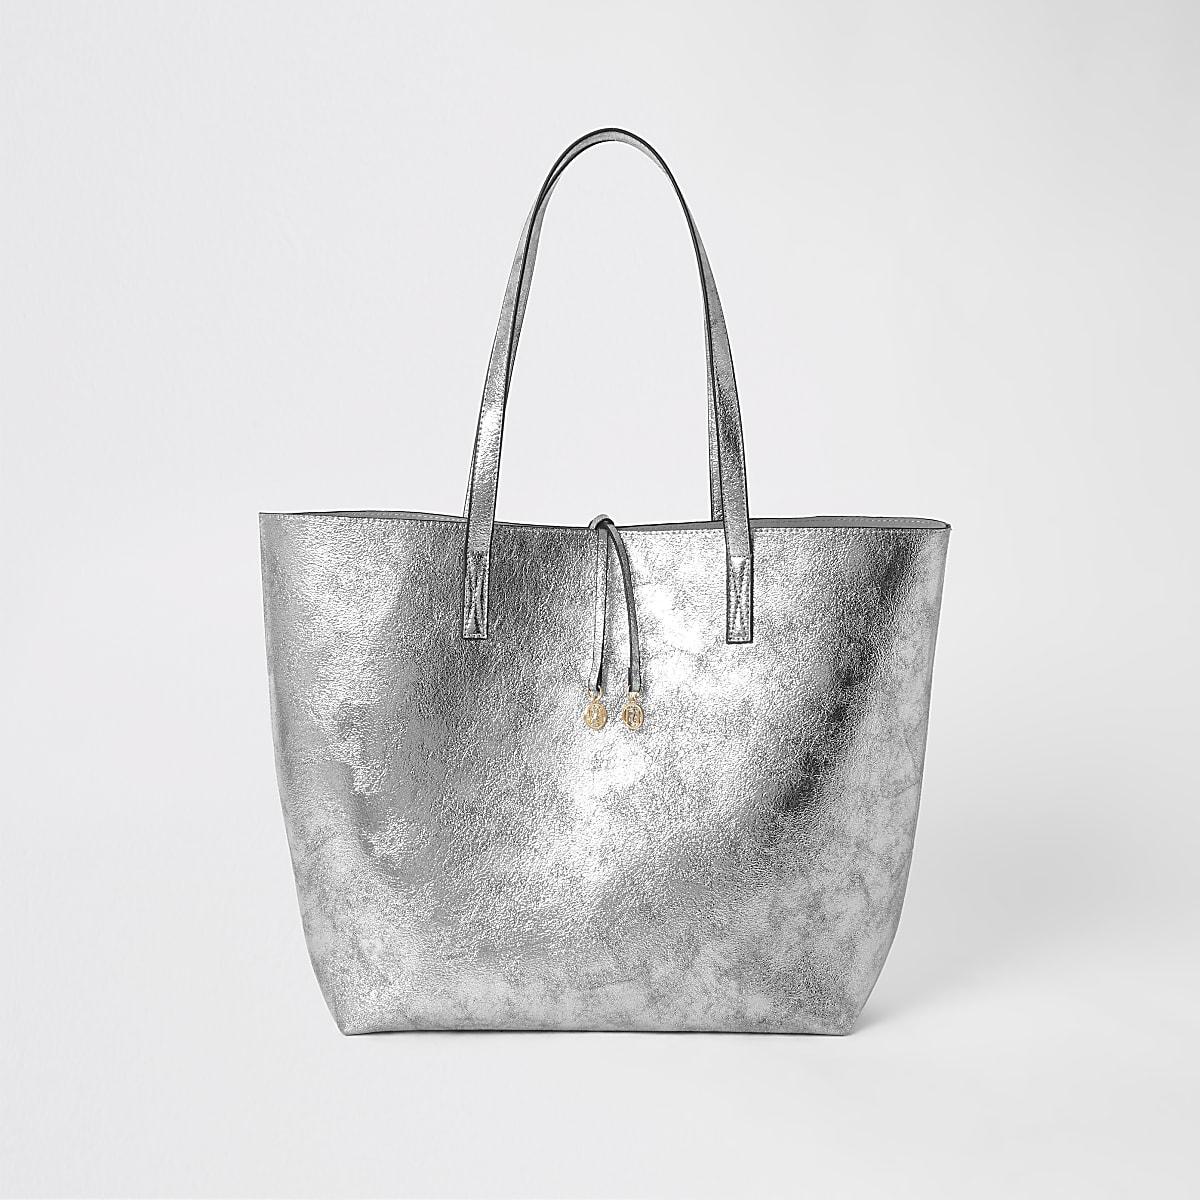 Silver tote shopper bag